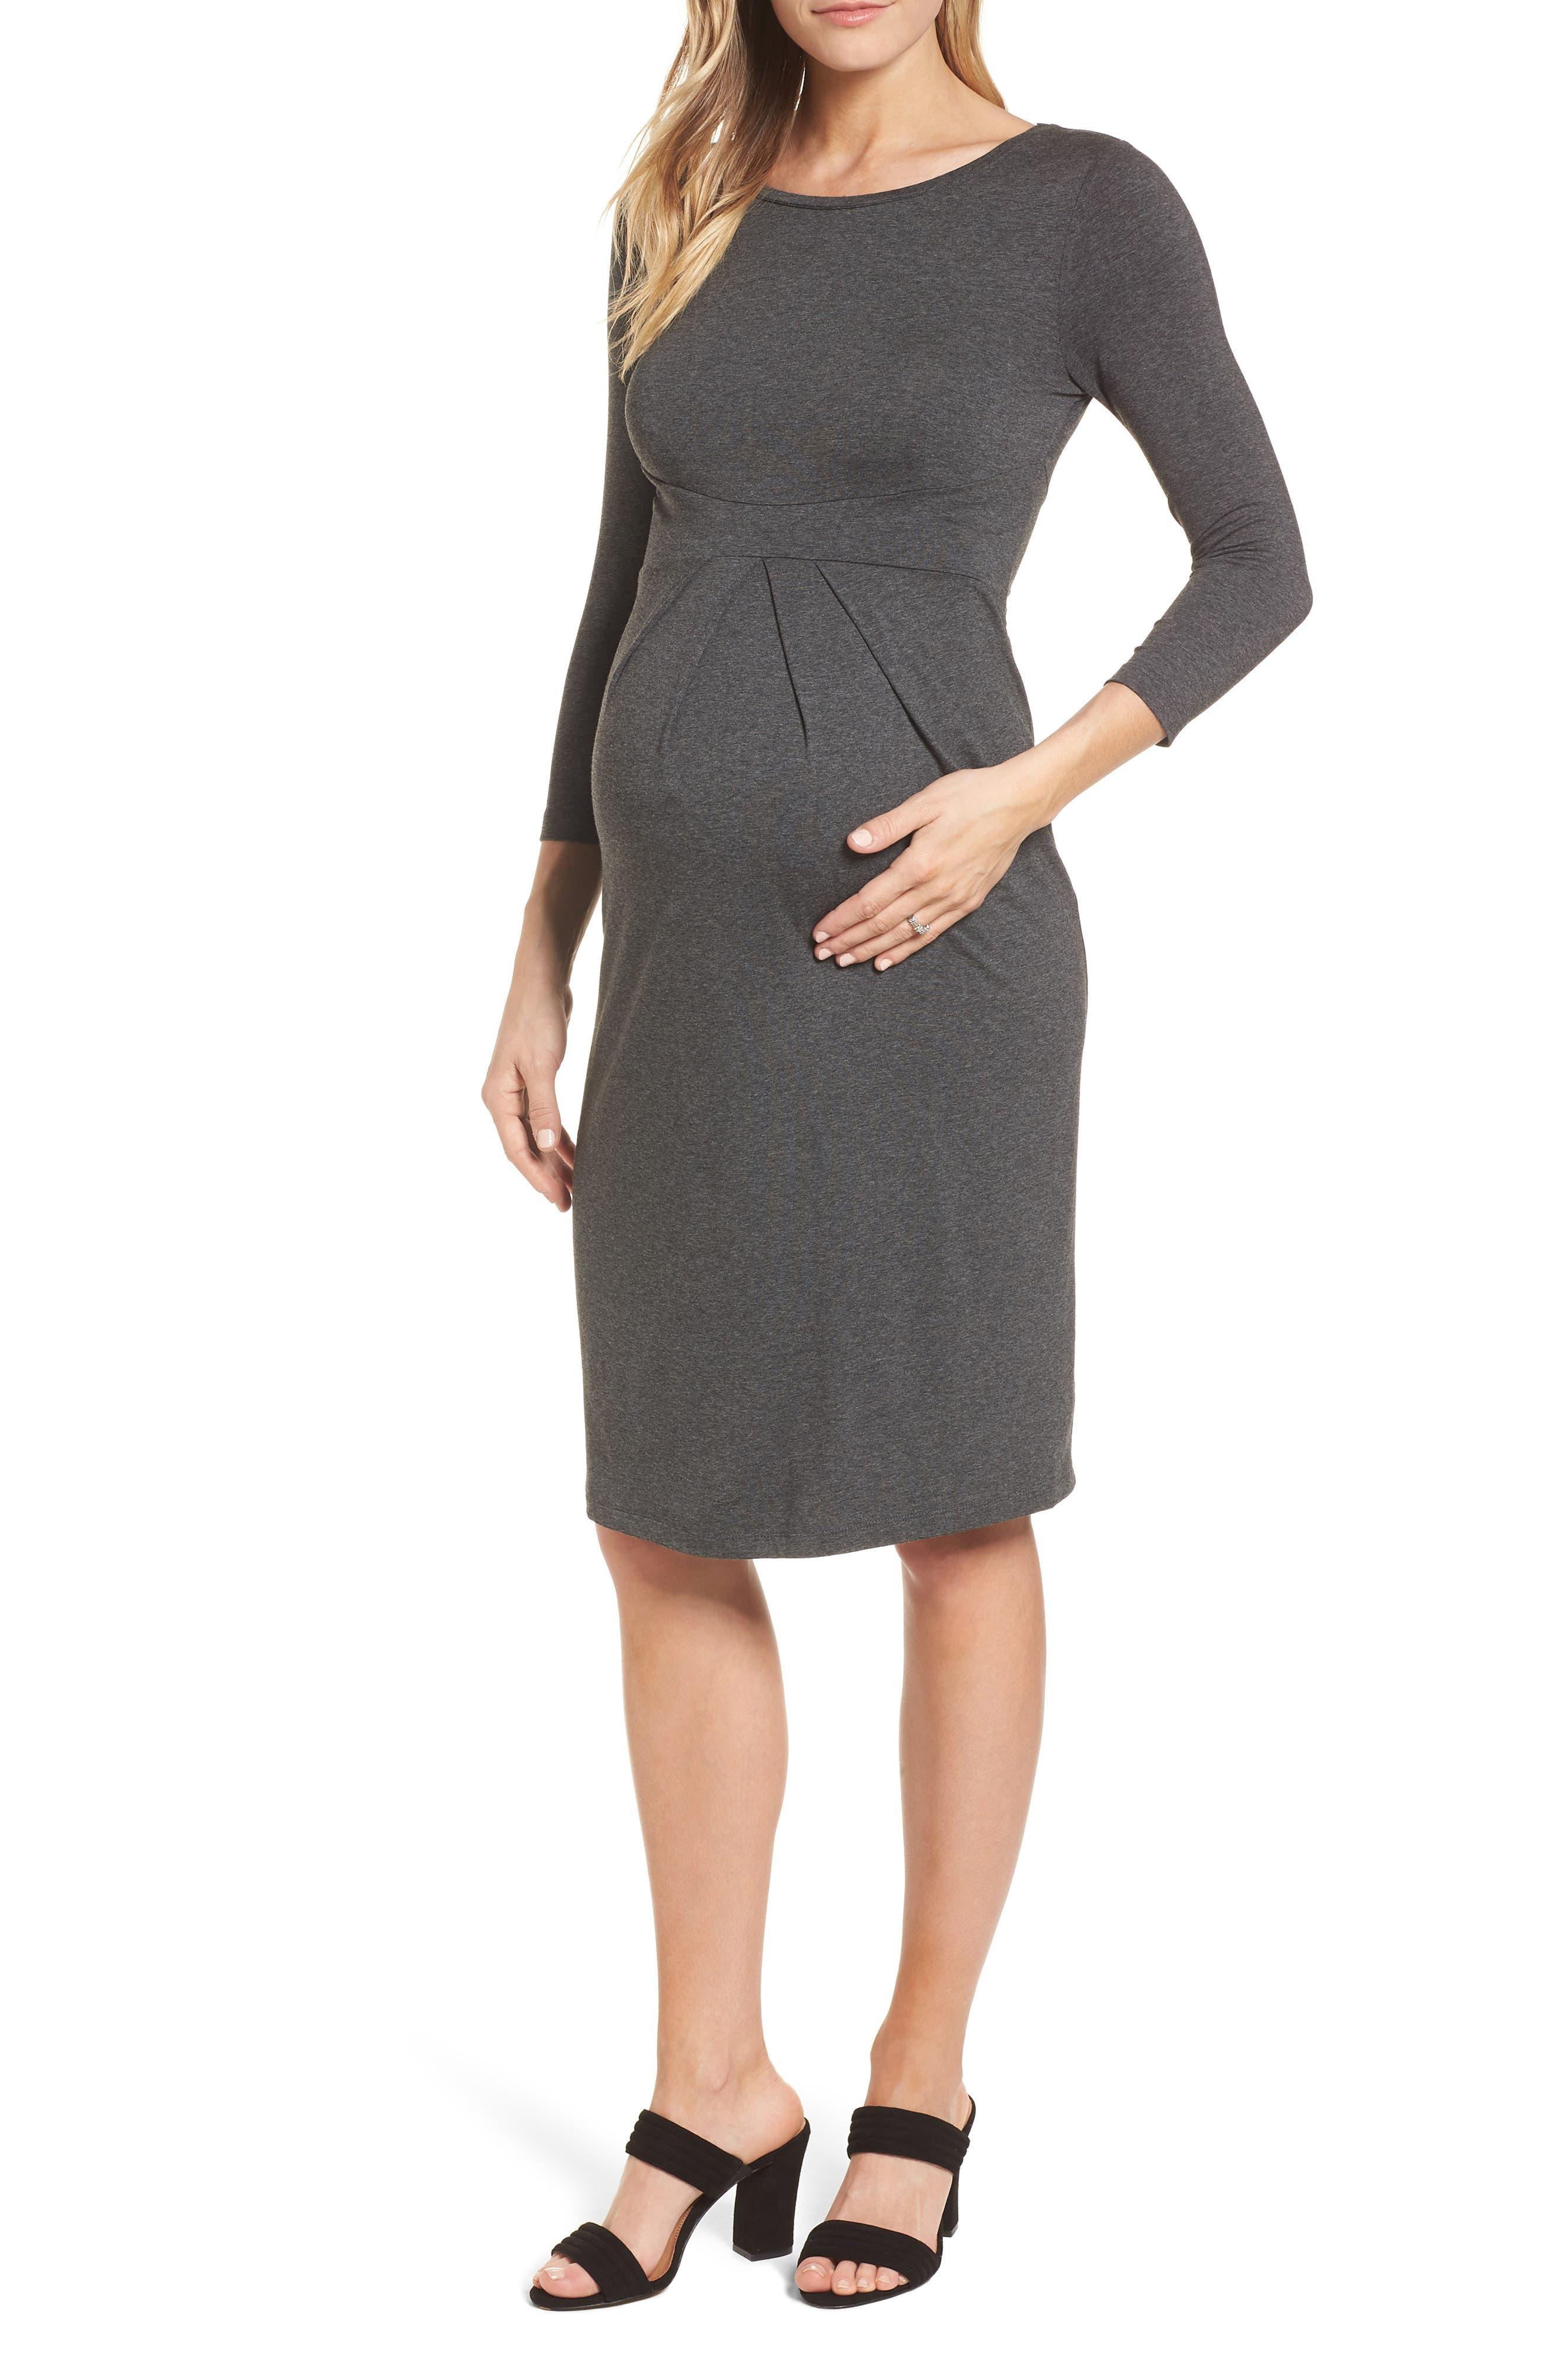 Ivybridge Jersey Maternity Dress,                         Main,                         color, Dark Grey Marl